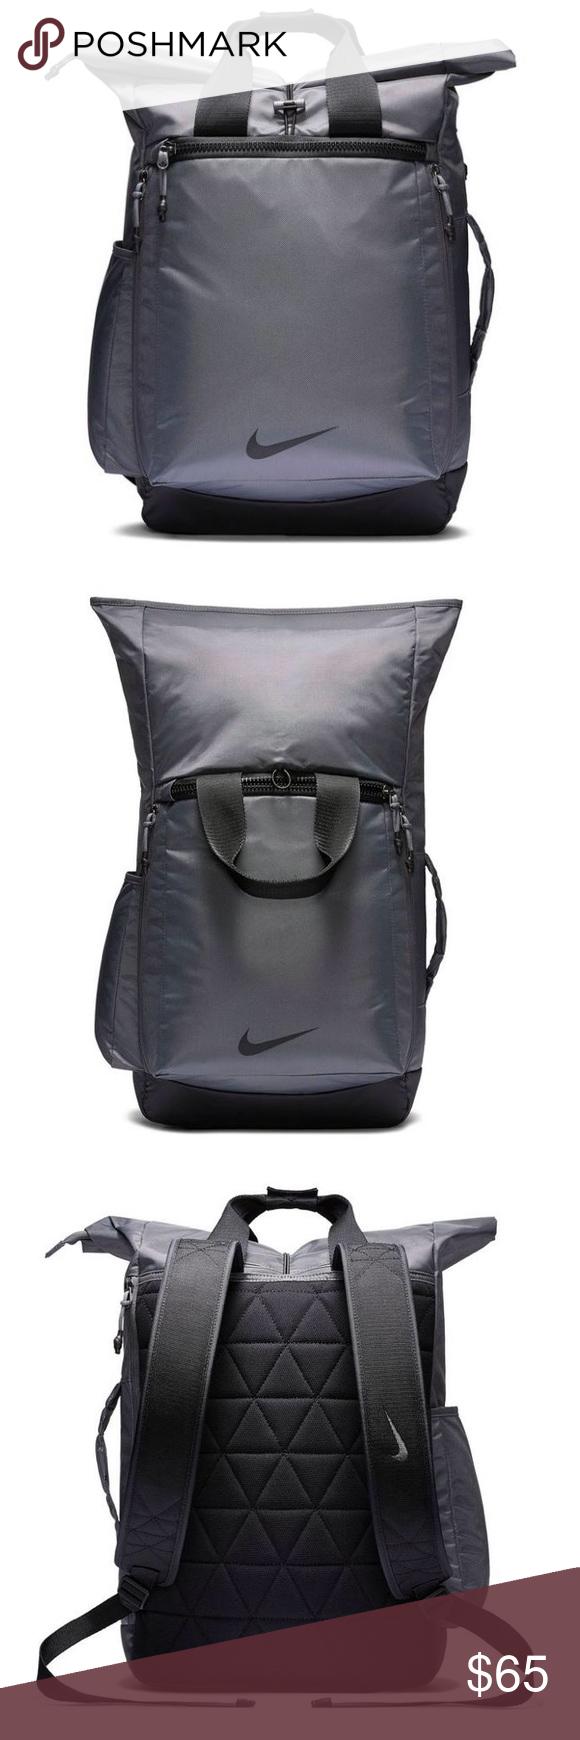 Nike Vapor Energy backpack 2.0. NWT  85 The Nike Vapor Energy 2.0 Training  Backpack features 3dbe4ac11b34f